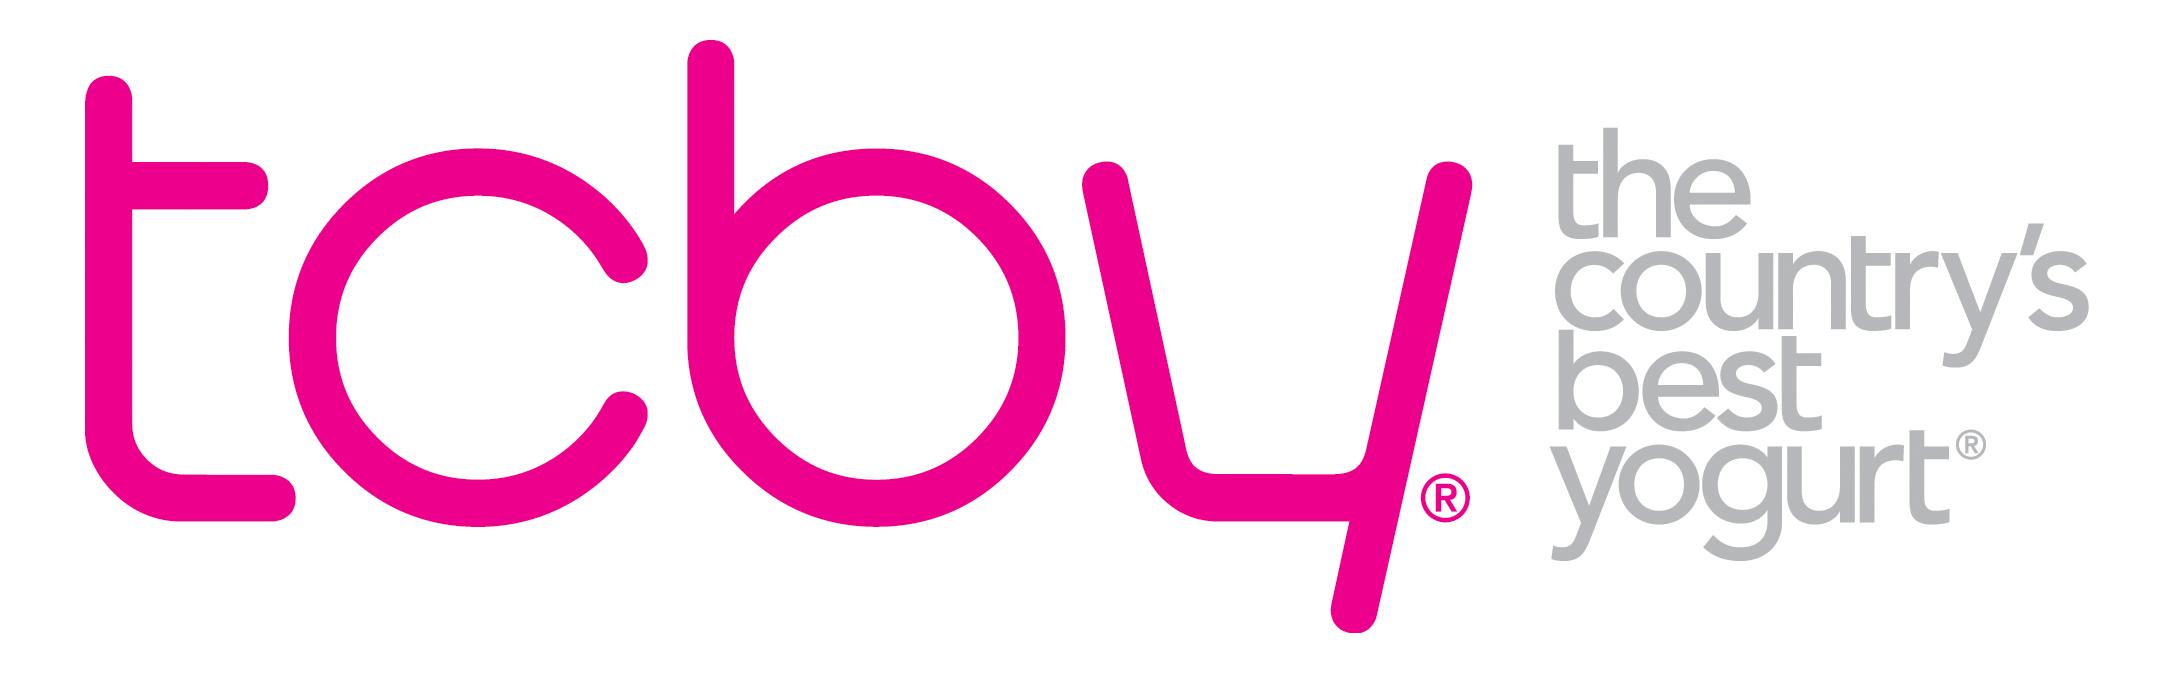 tcby logo jpeg